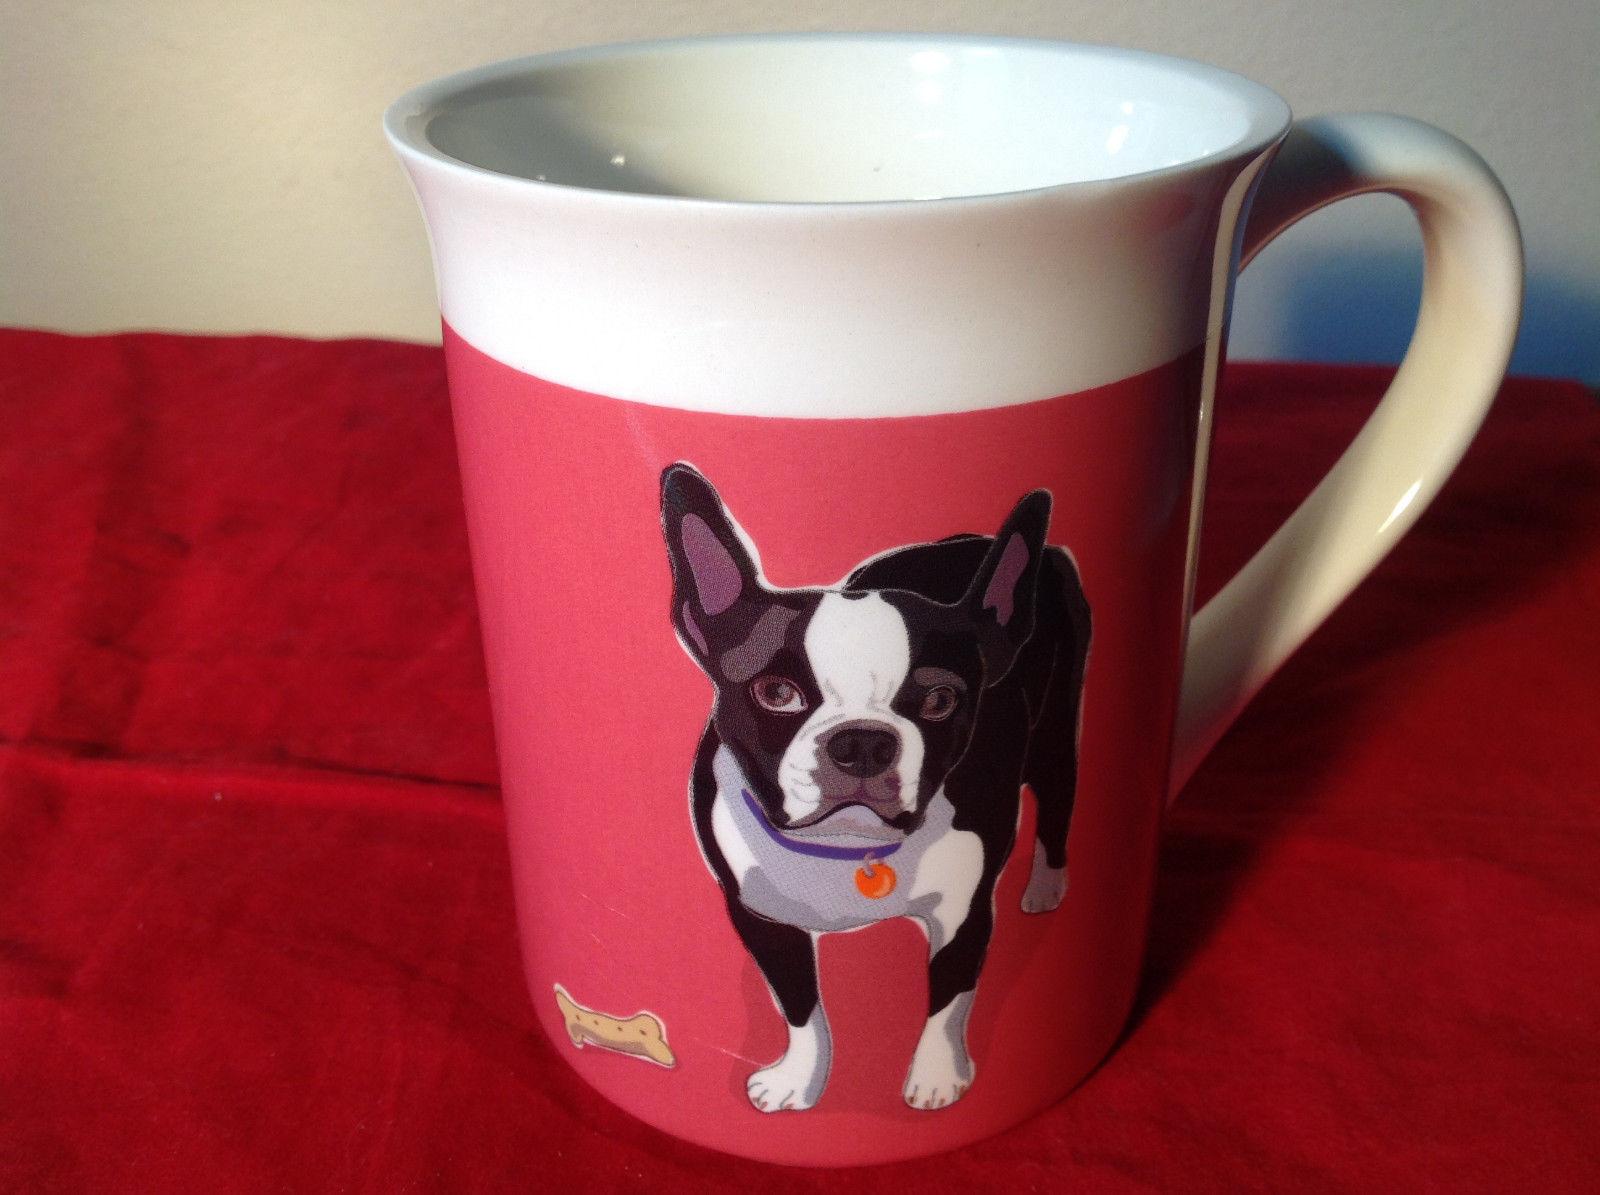 Go Dog Boston Terrier Mug by Paper Russells w Original Box 16 oz Department 56